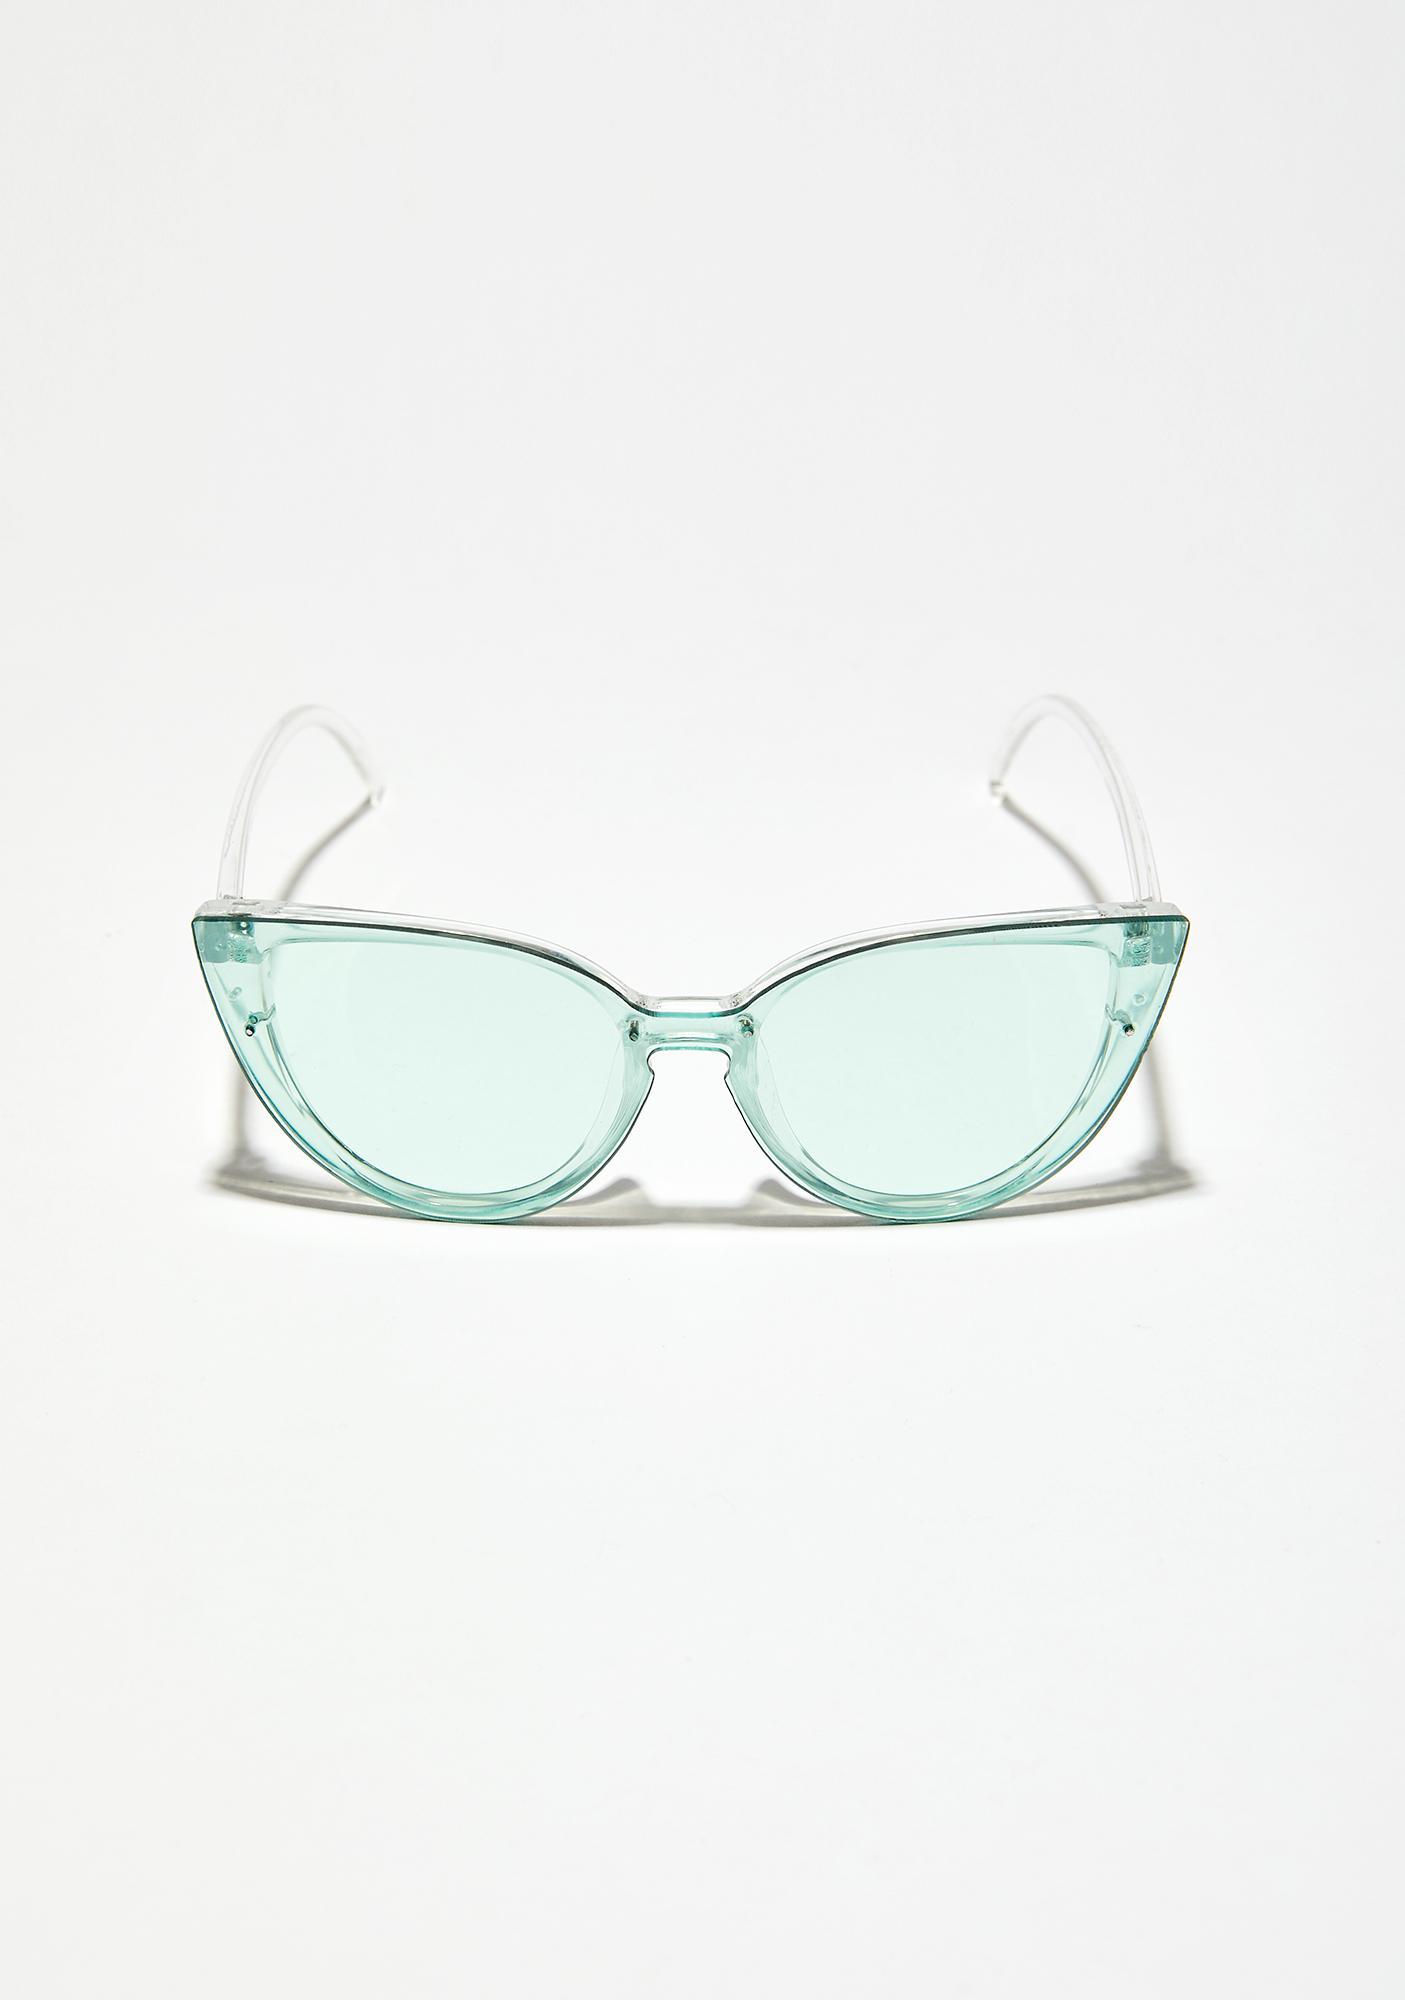 Minty Fresh Oversize Sunglasses